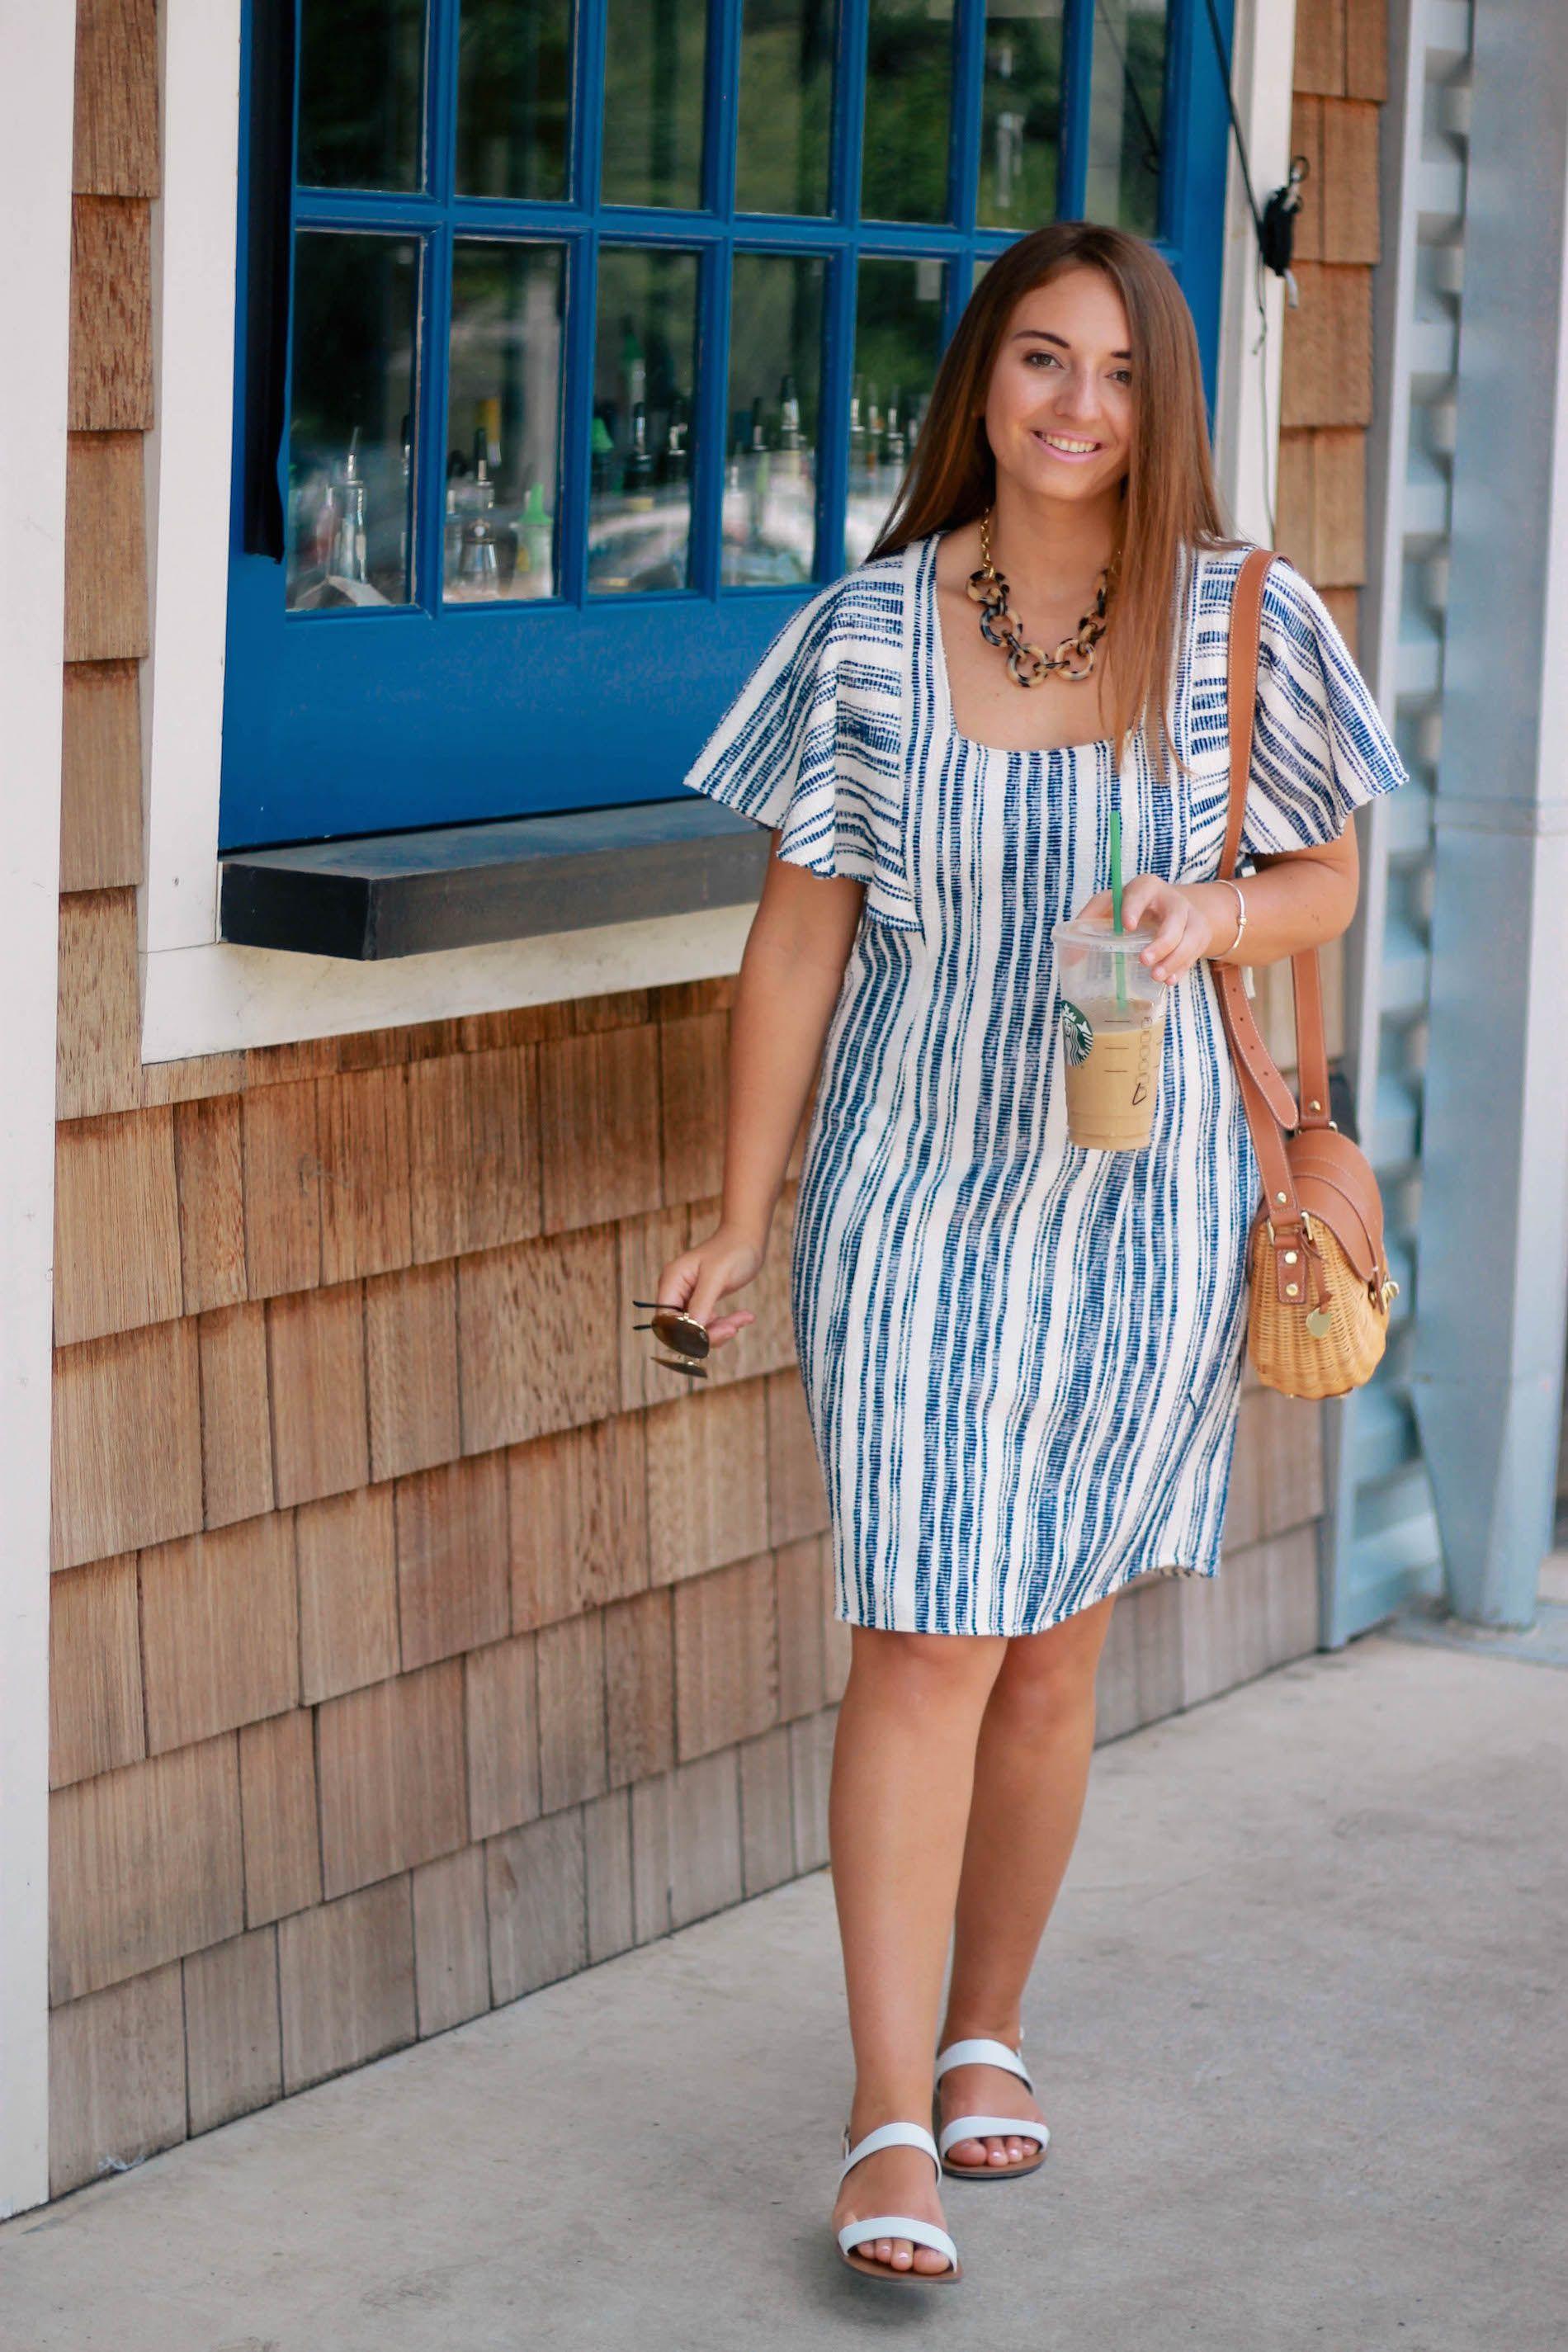 80 S Summer Style The Coastal Confidence New England Fashion Summer Fashion Fashion [ 2850 x 1900 Pixel ]